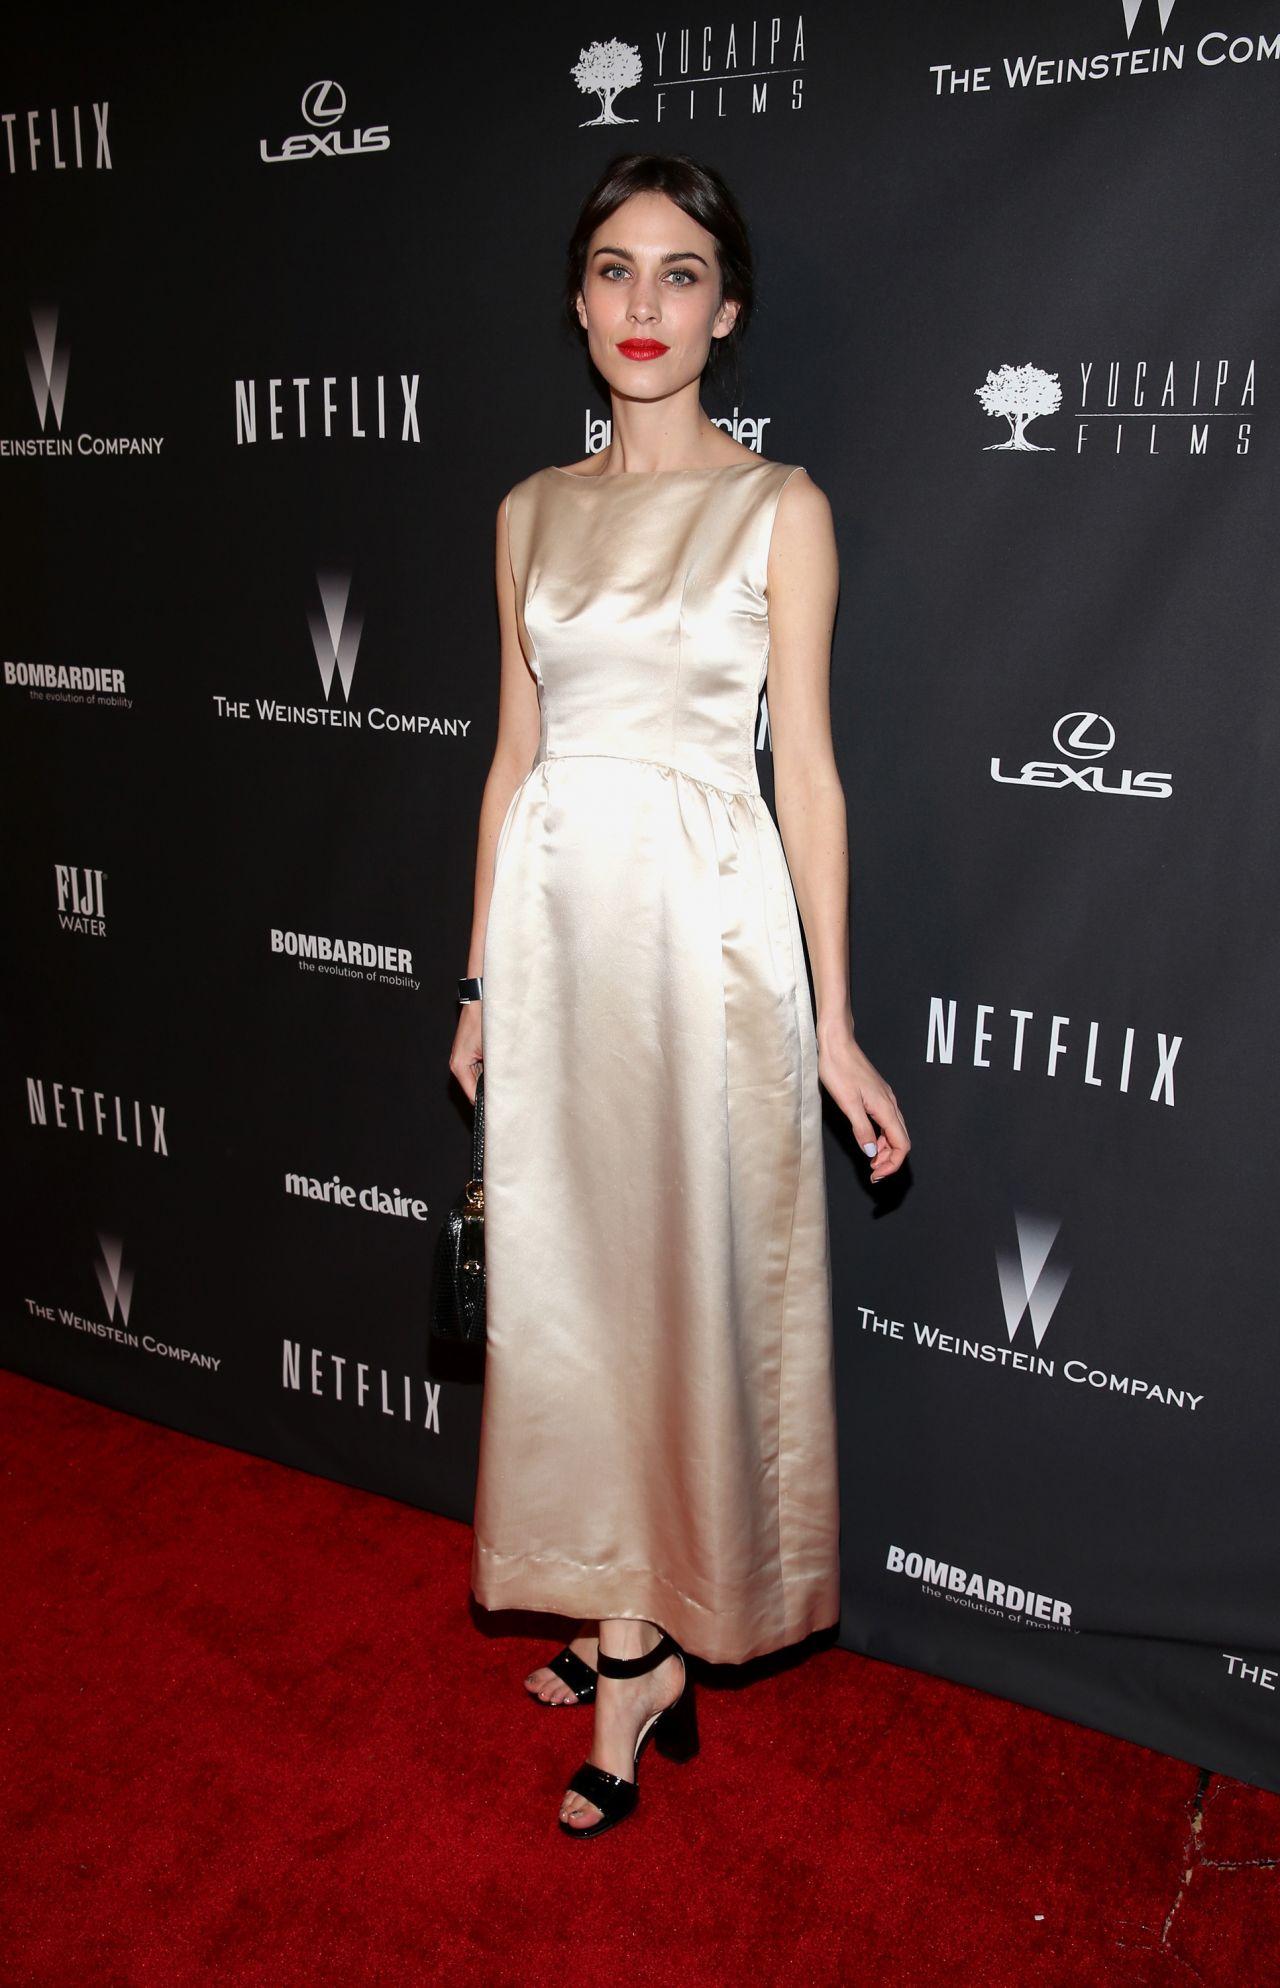 Alexa Chung Wears Vintage Balenciaga Dress At 2014 Golden